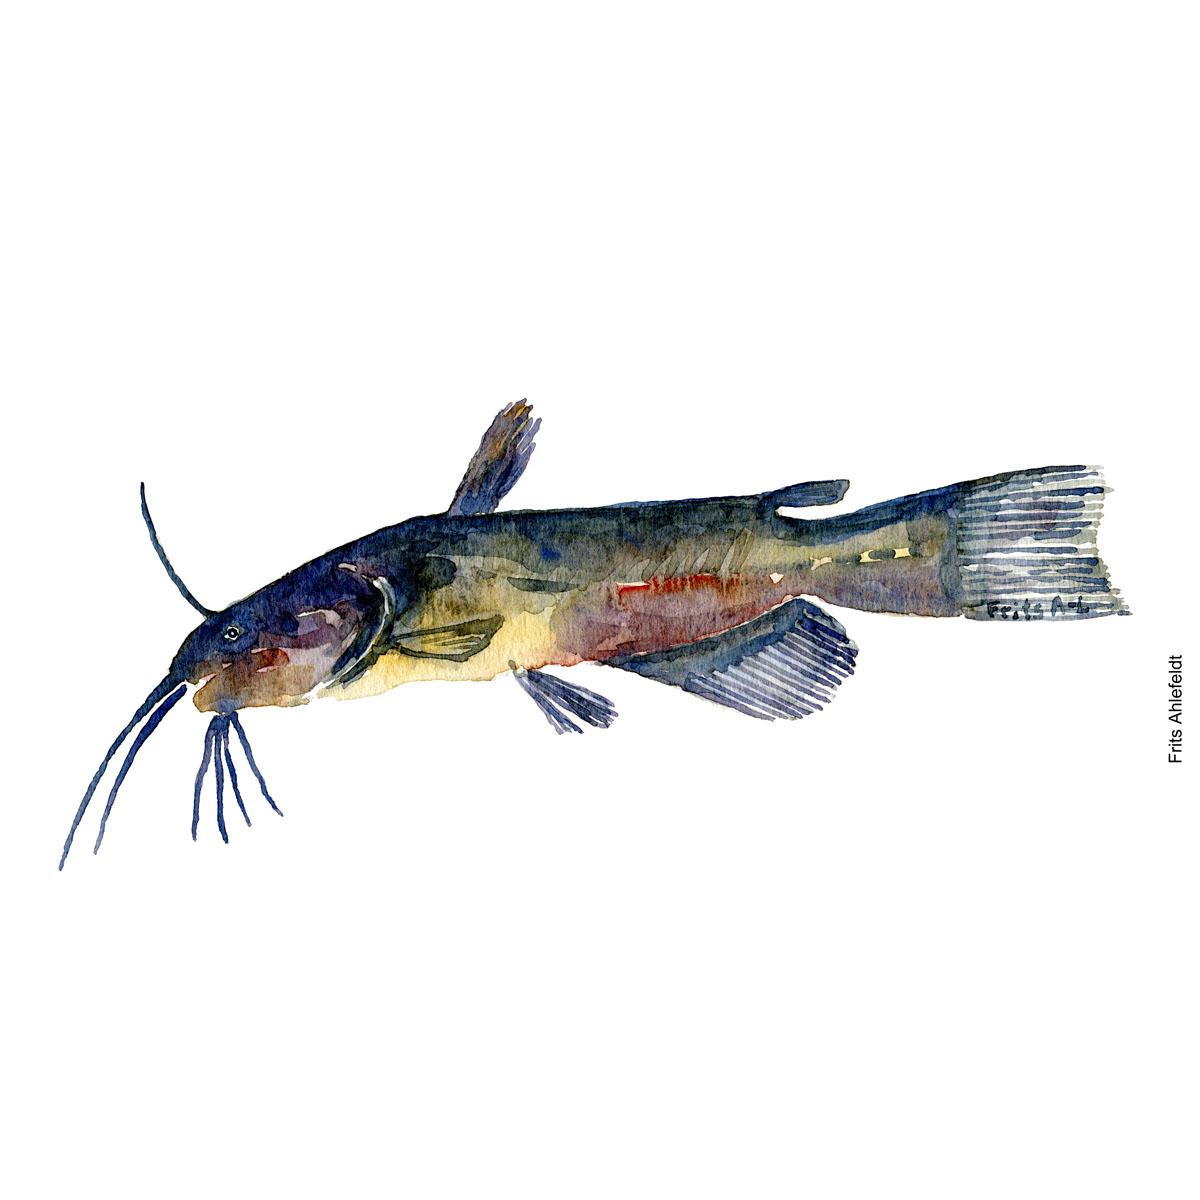 Illustration of Brown bullhead. Brun dværgmalle. Freshwater fish watercolour handmade by Frits Ahlefeldt